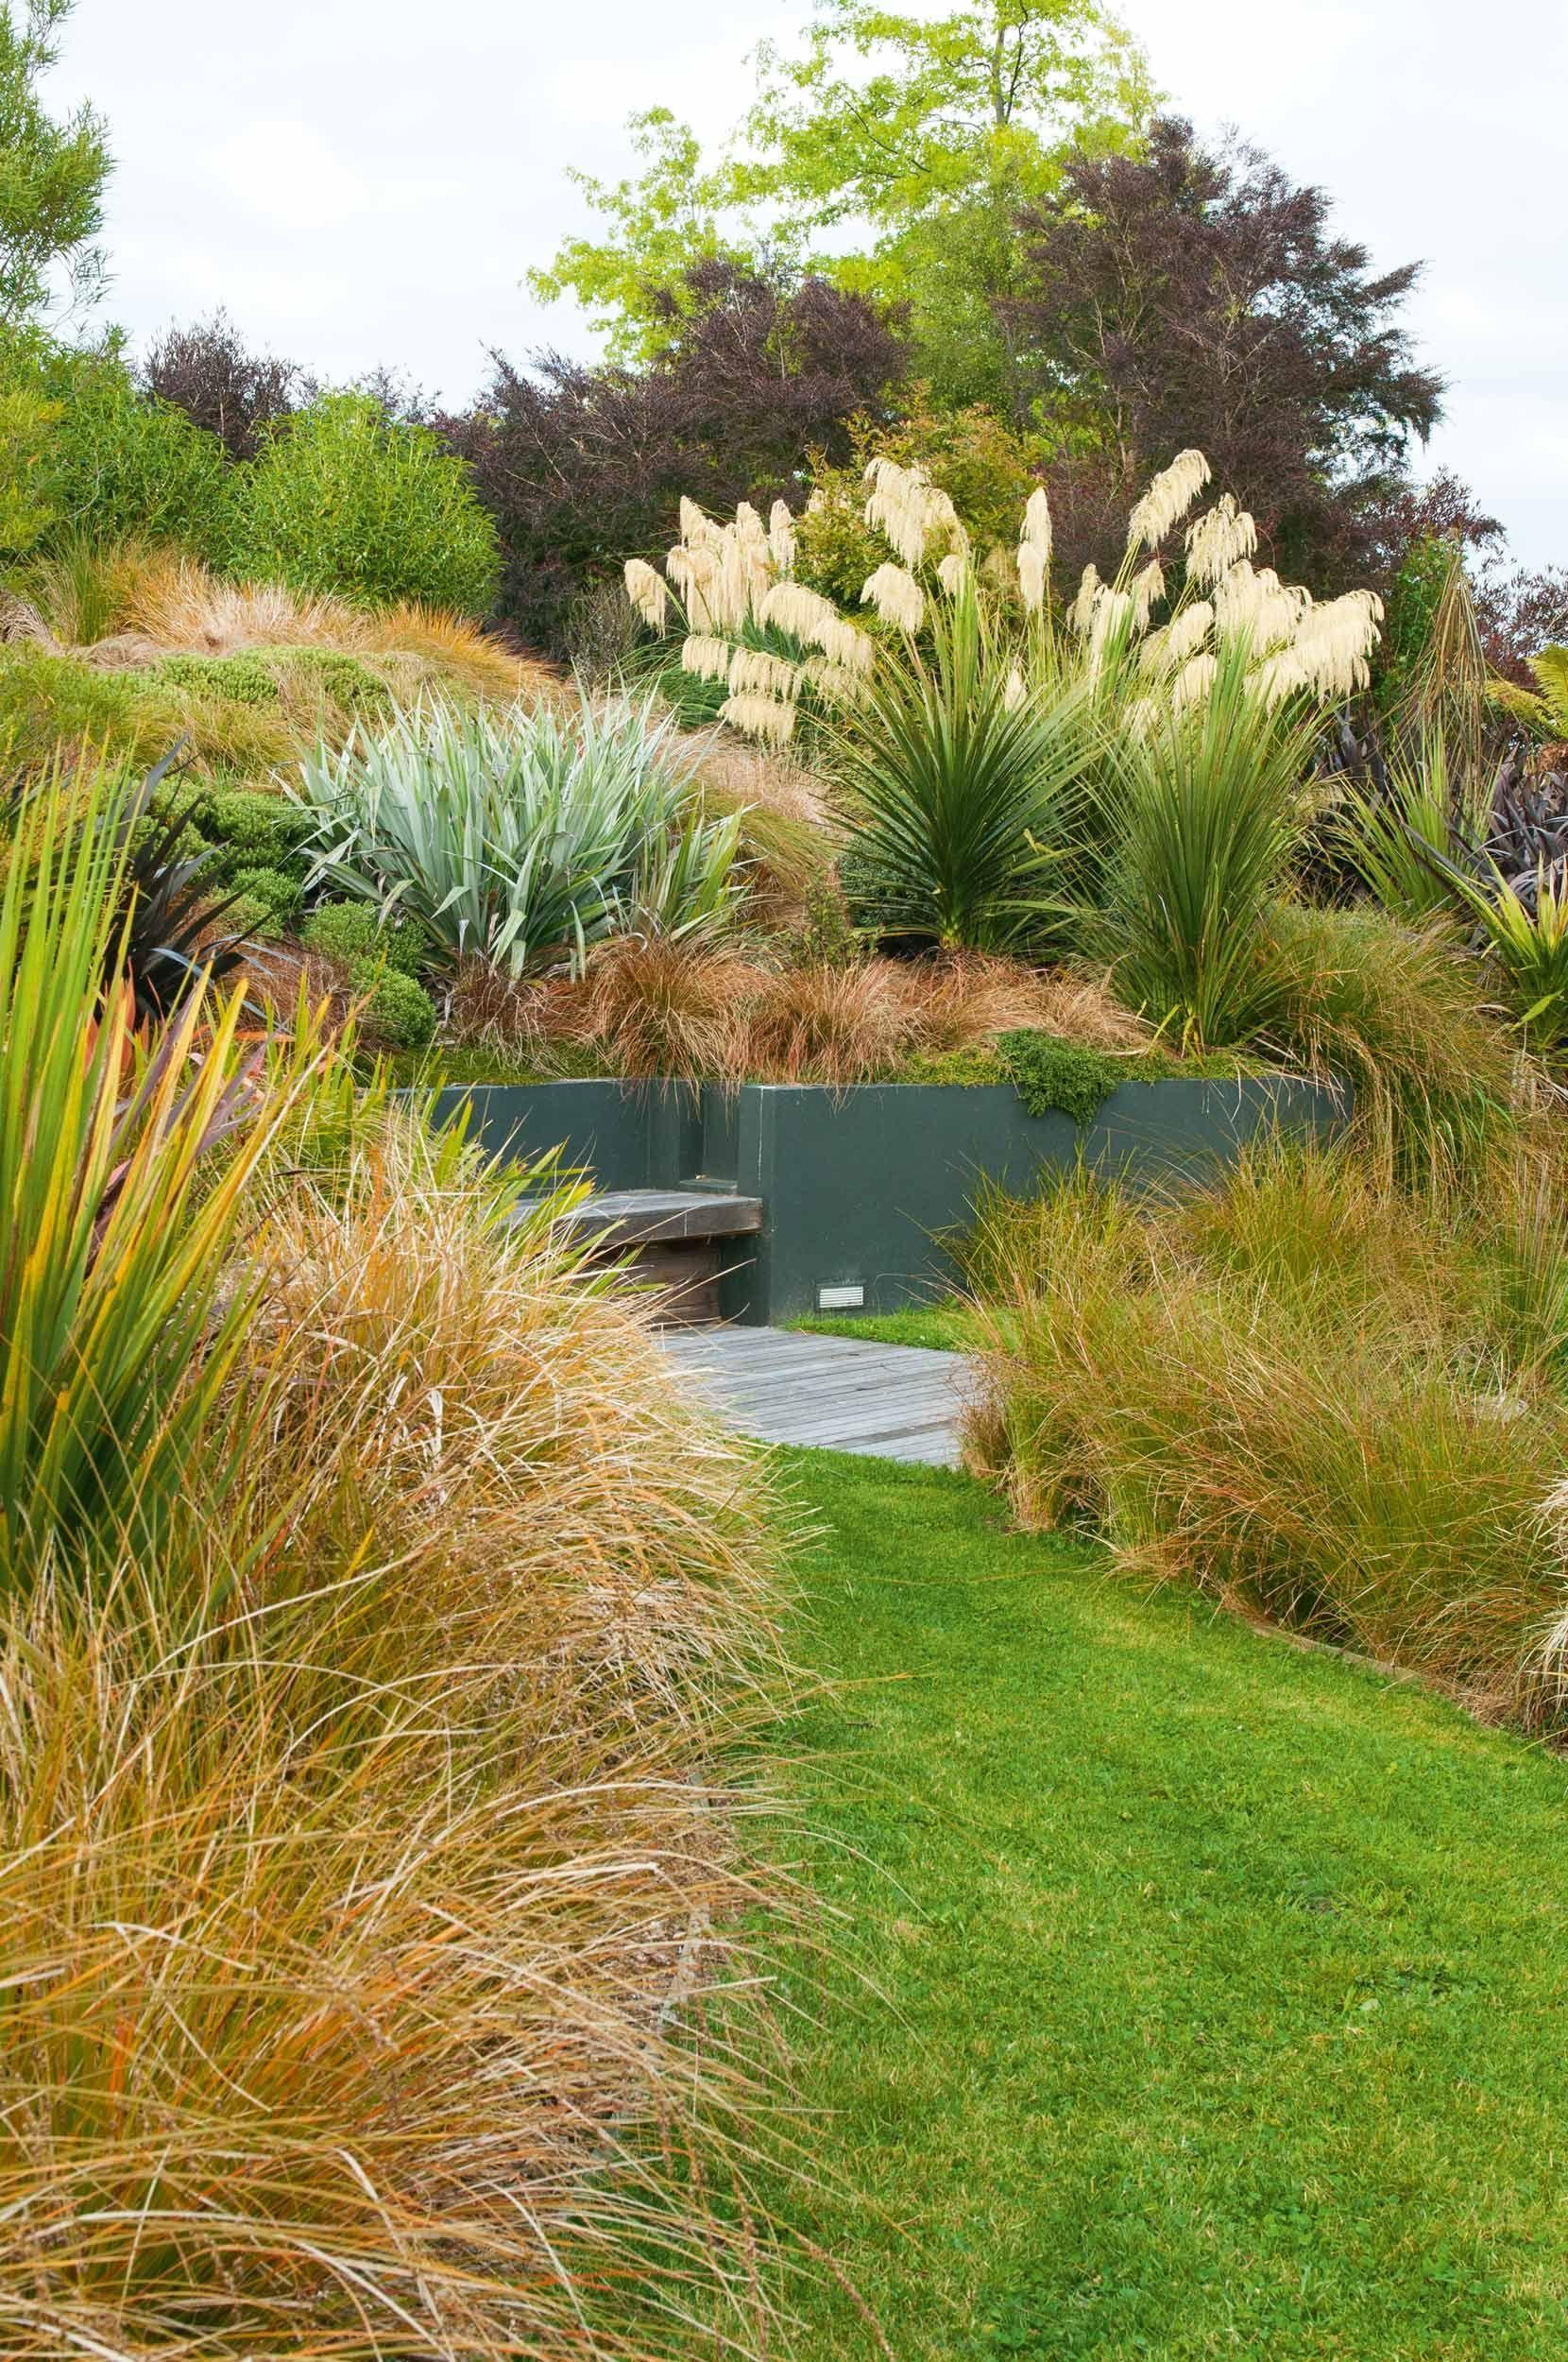 Gardens Nz New Zealand . Gardens Nz in 2020 | Garden ...